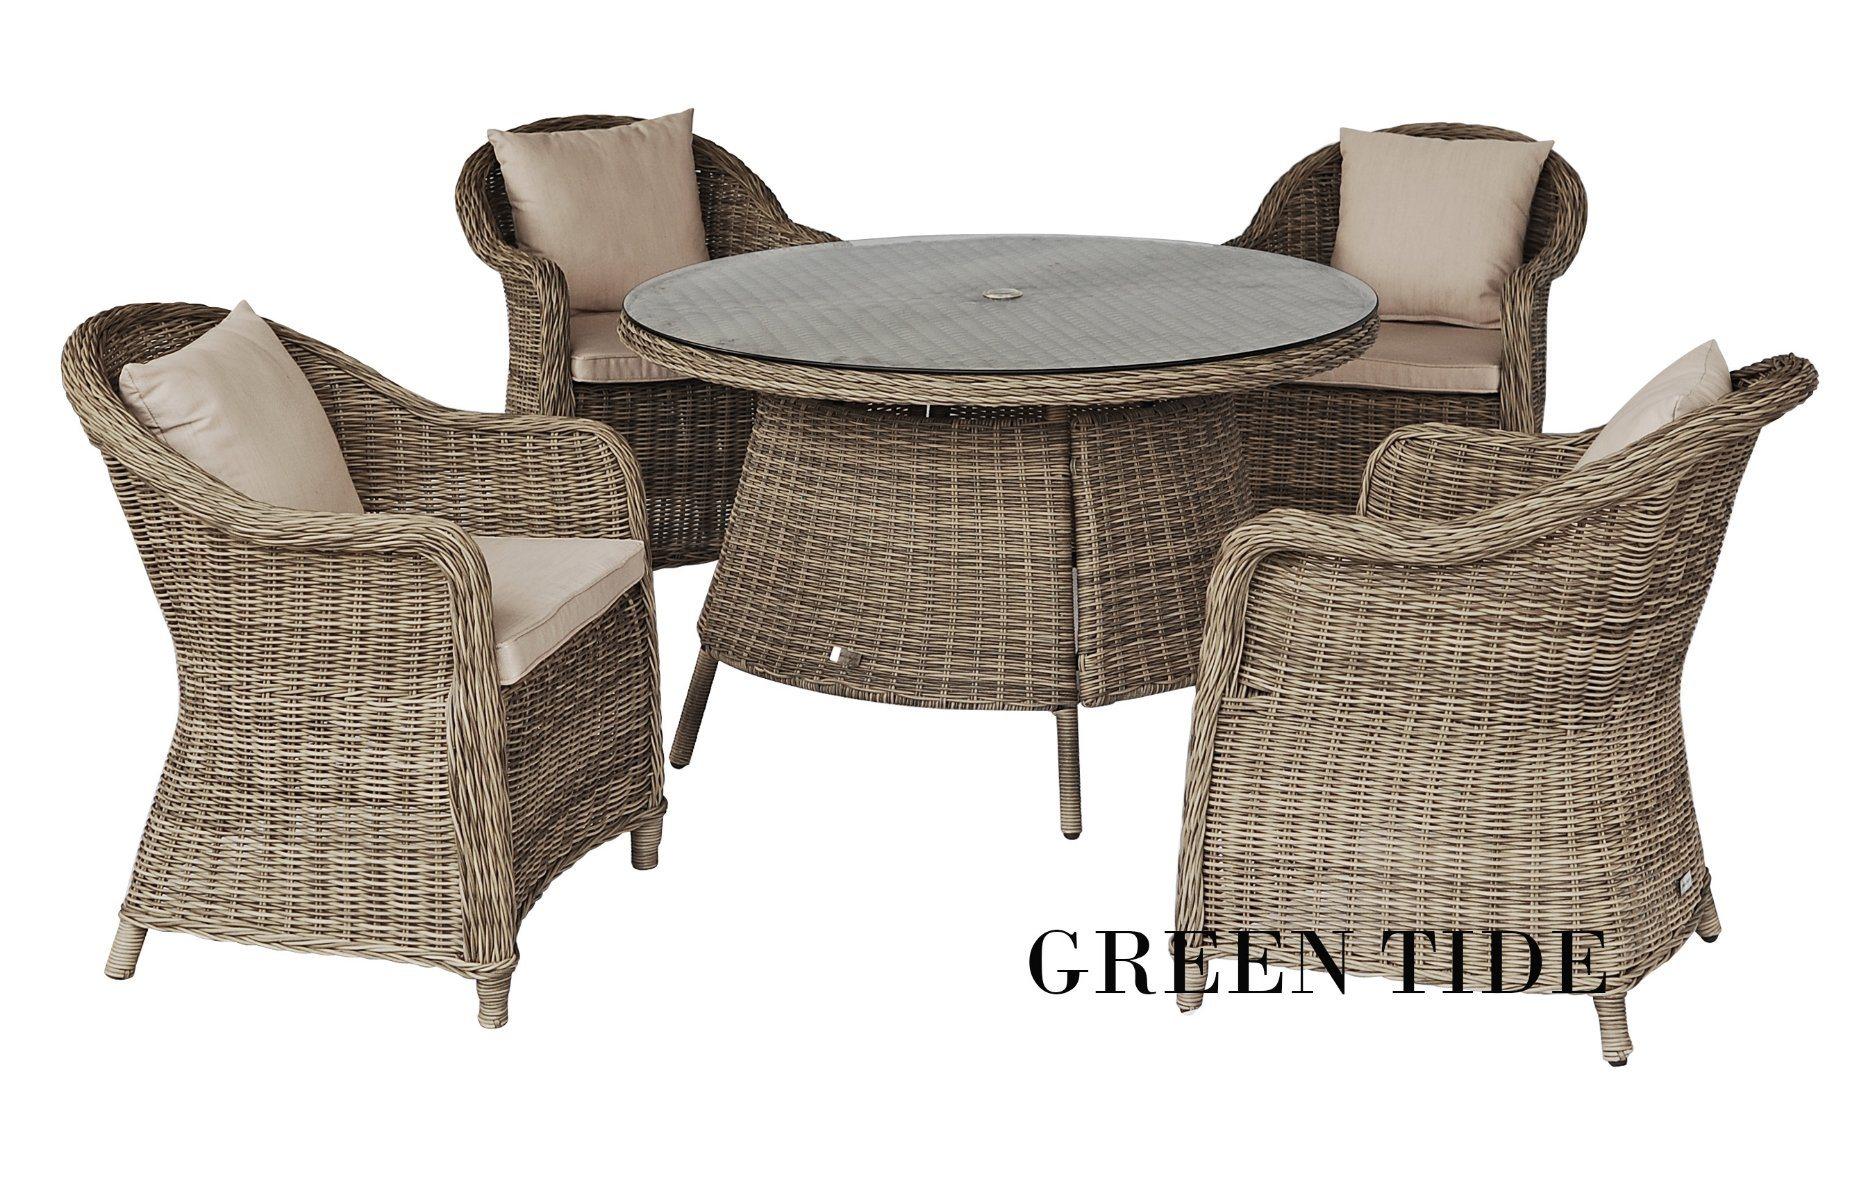 Round Wicker Rattan Dining Furniture